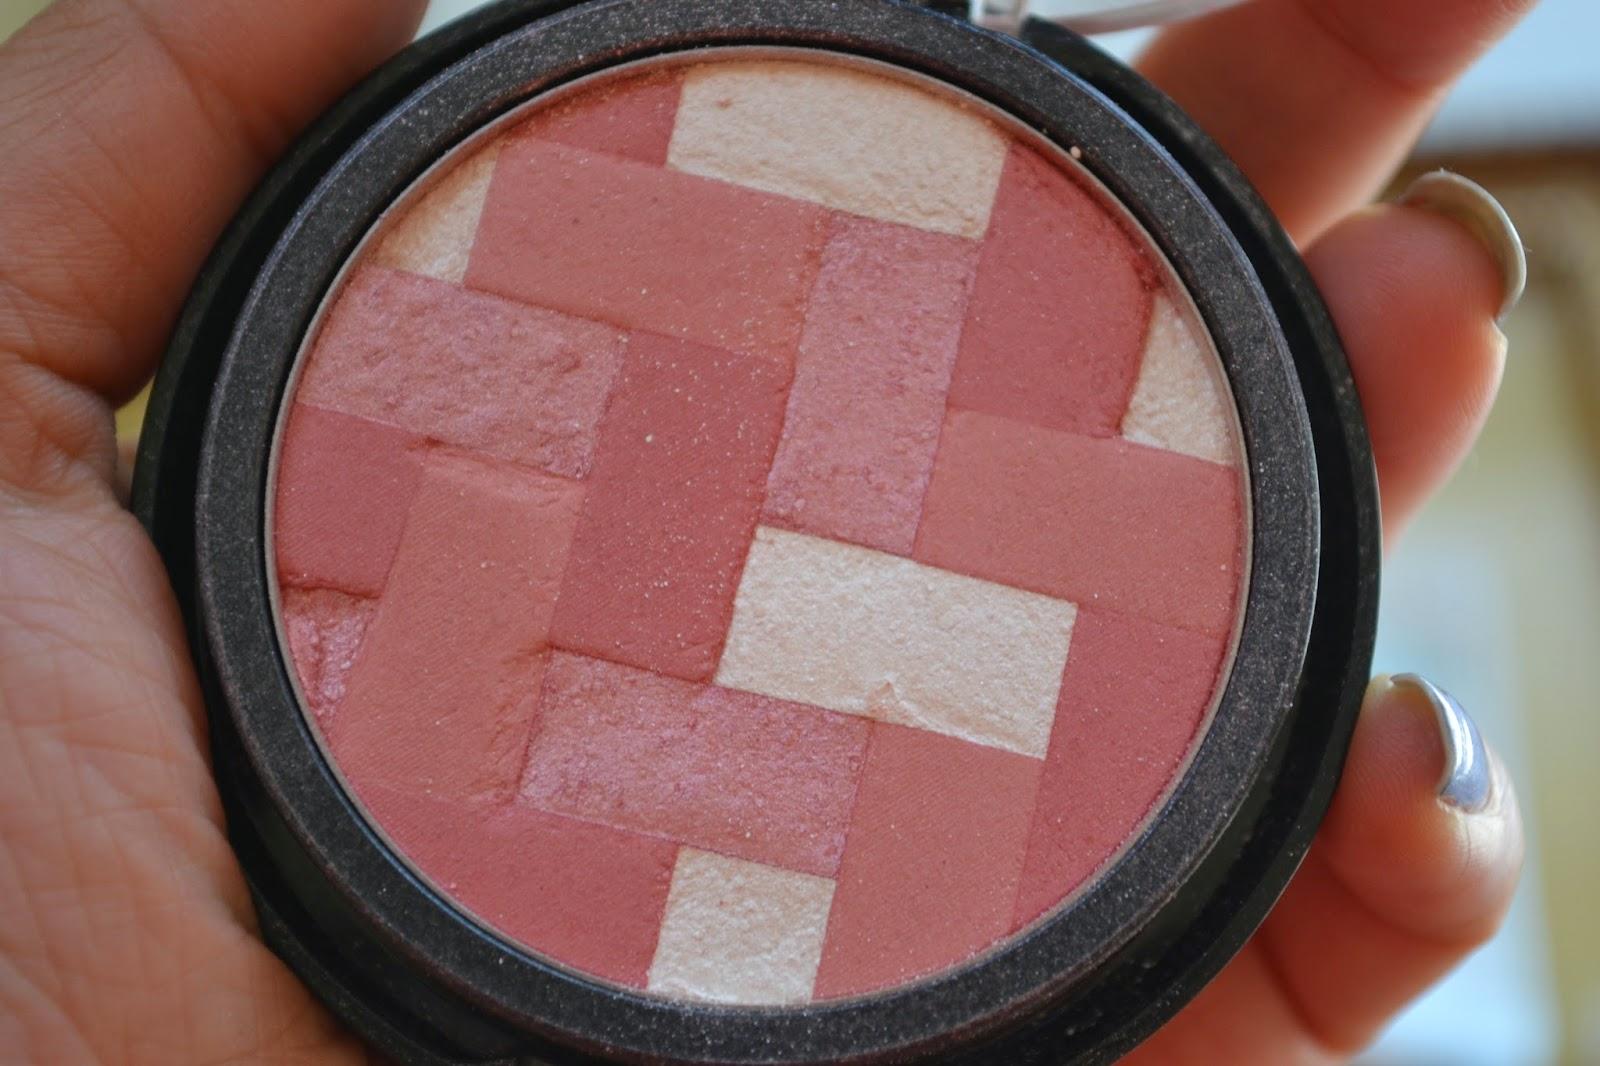 Maybelline New York Face Studio Master Hi-Light in Pink Rose